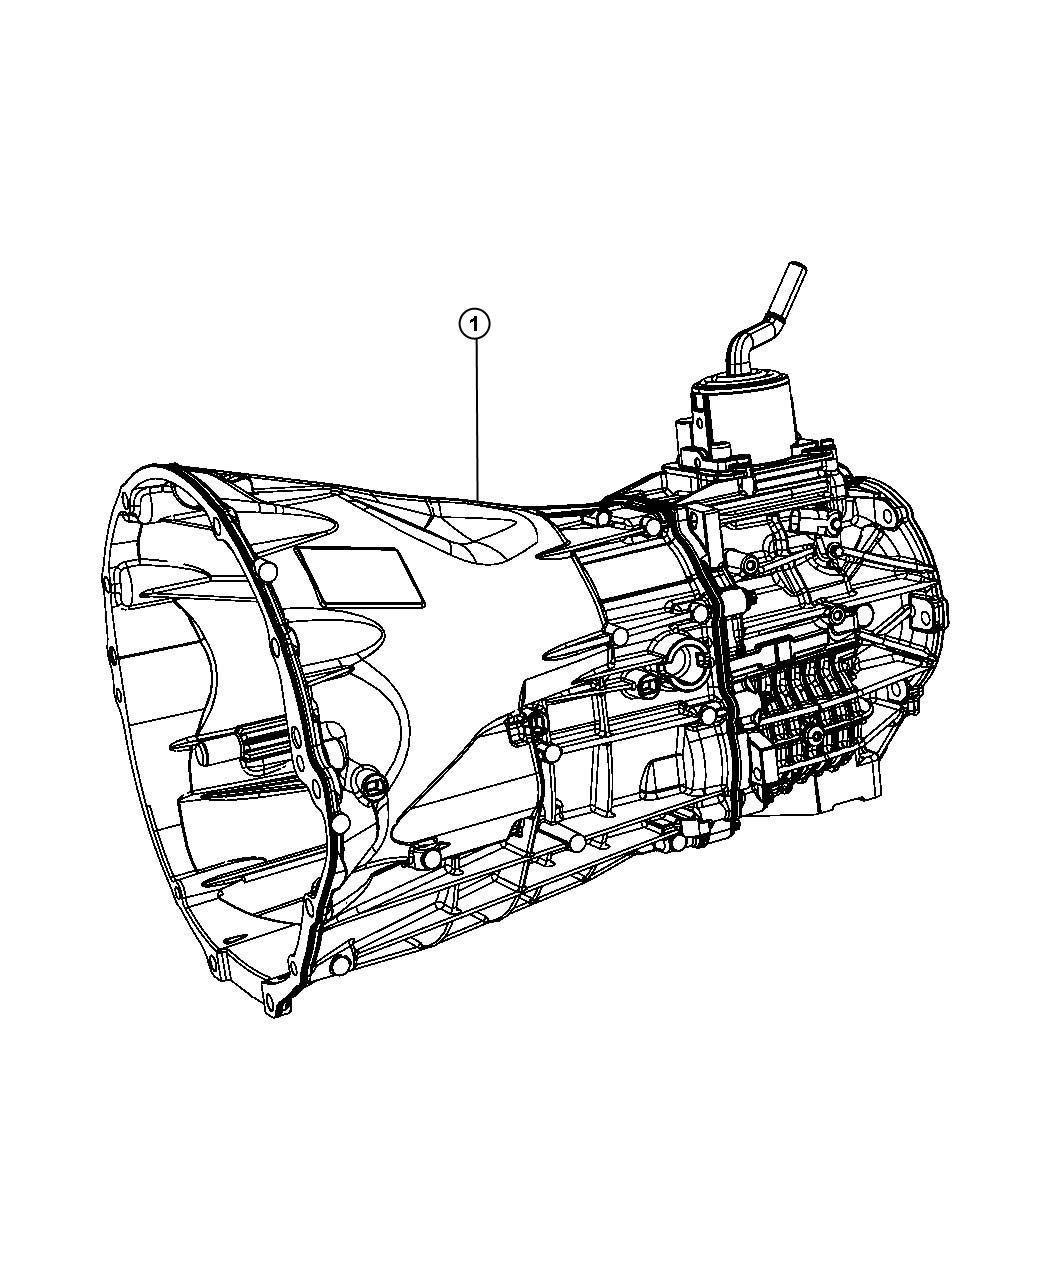 Dodge Nitro Transmission  Nsg370